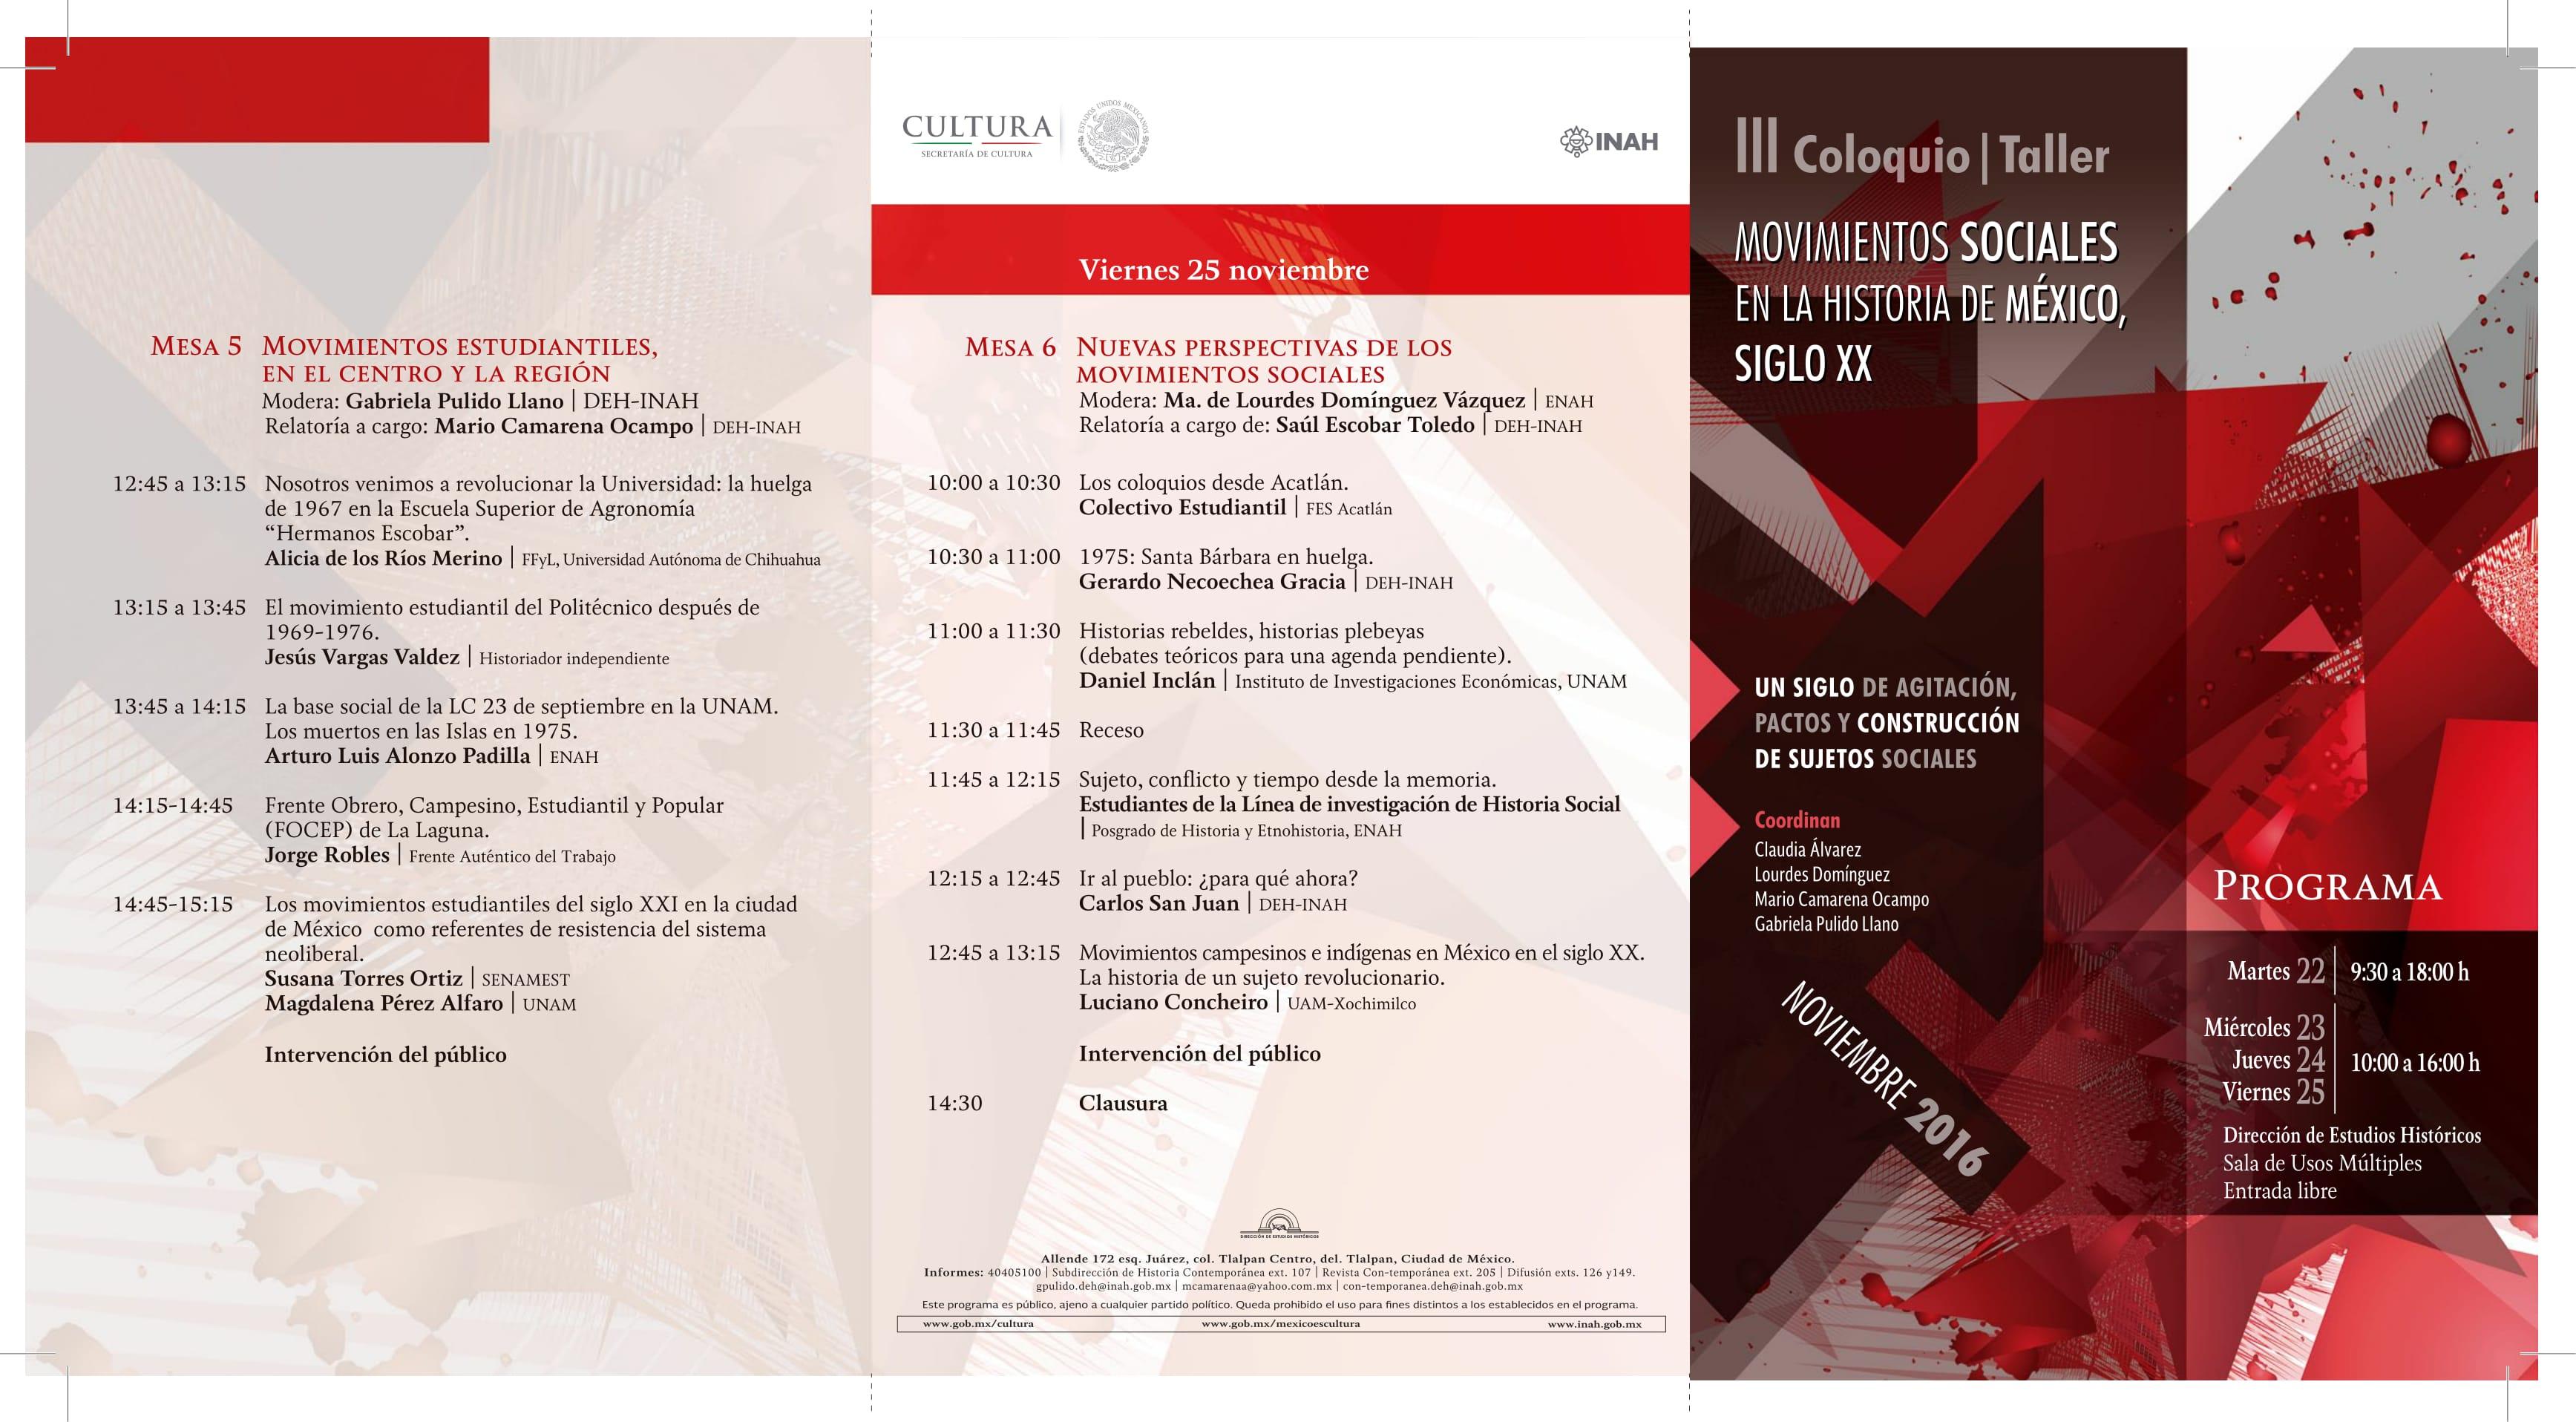 Programa III COLOQUIO/TALLER. MOVIMIENTOS SOCIALES EN LA HISTORIA DE MÉXICO, SIGLO XX - Frente